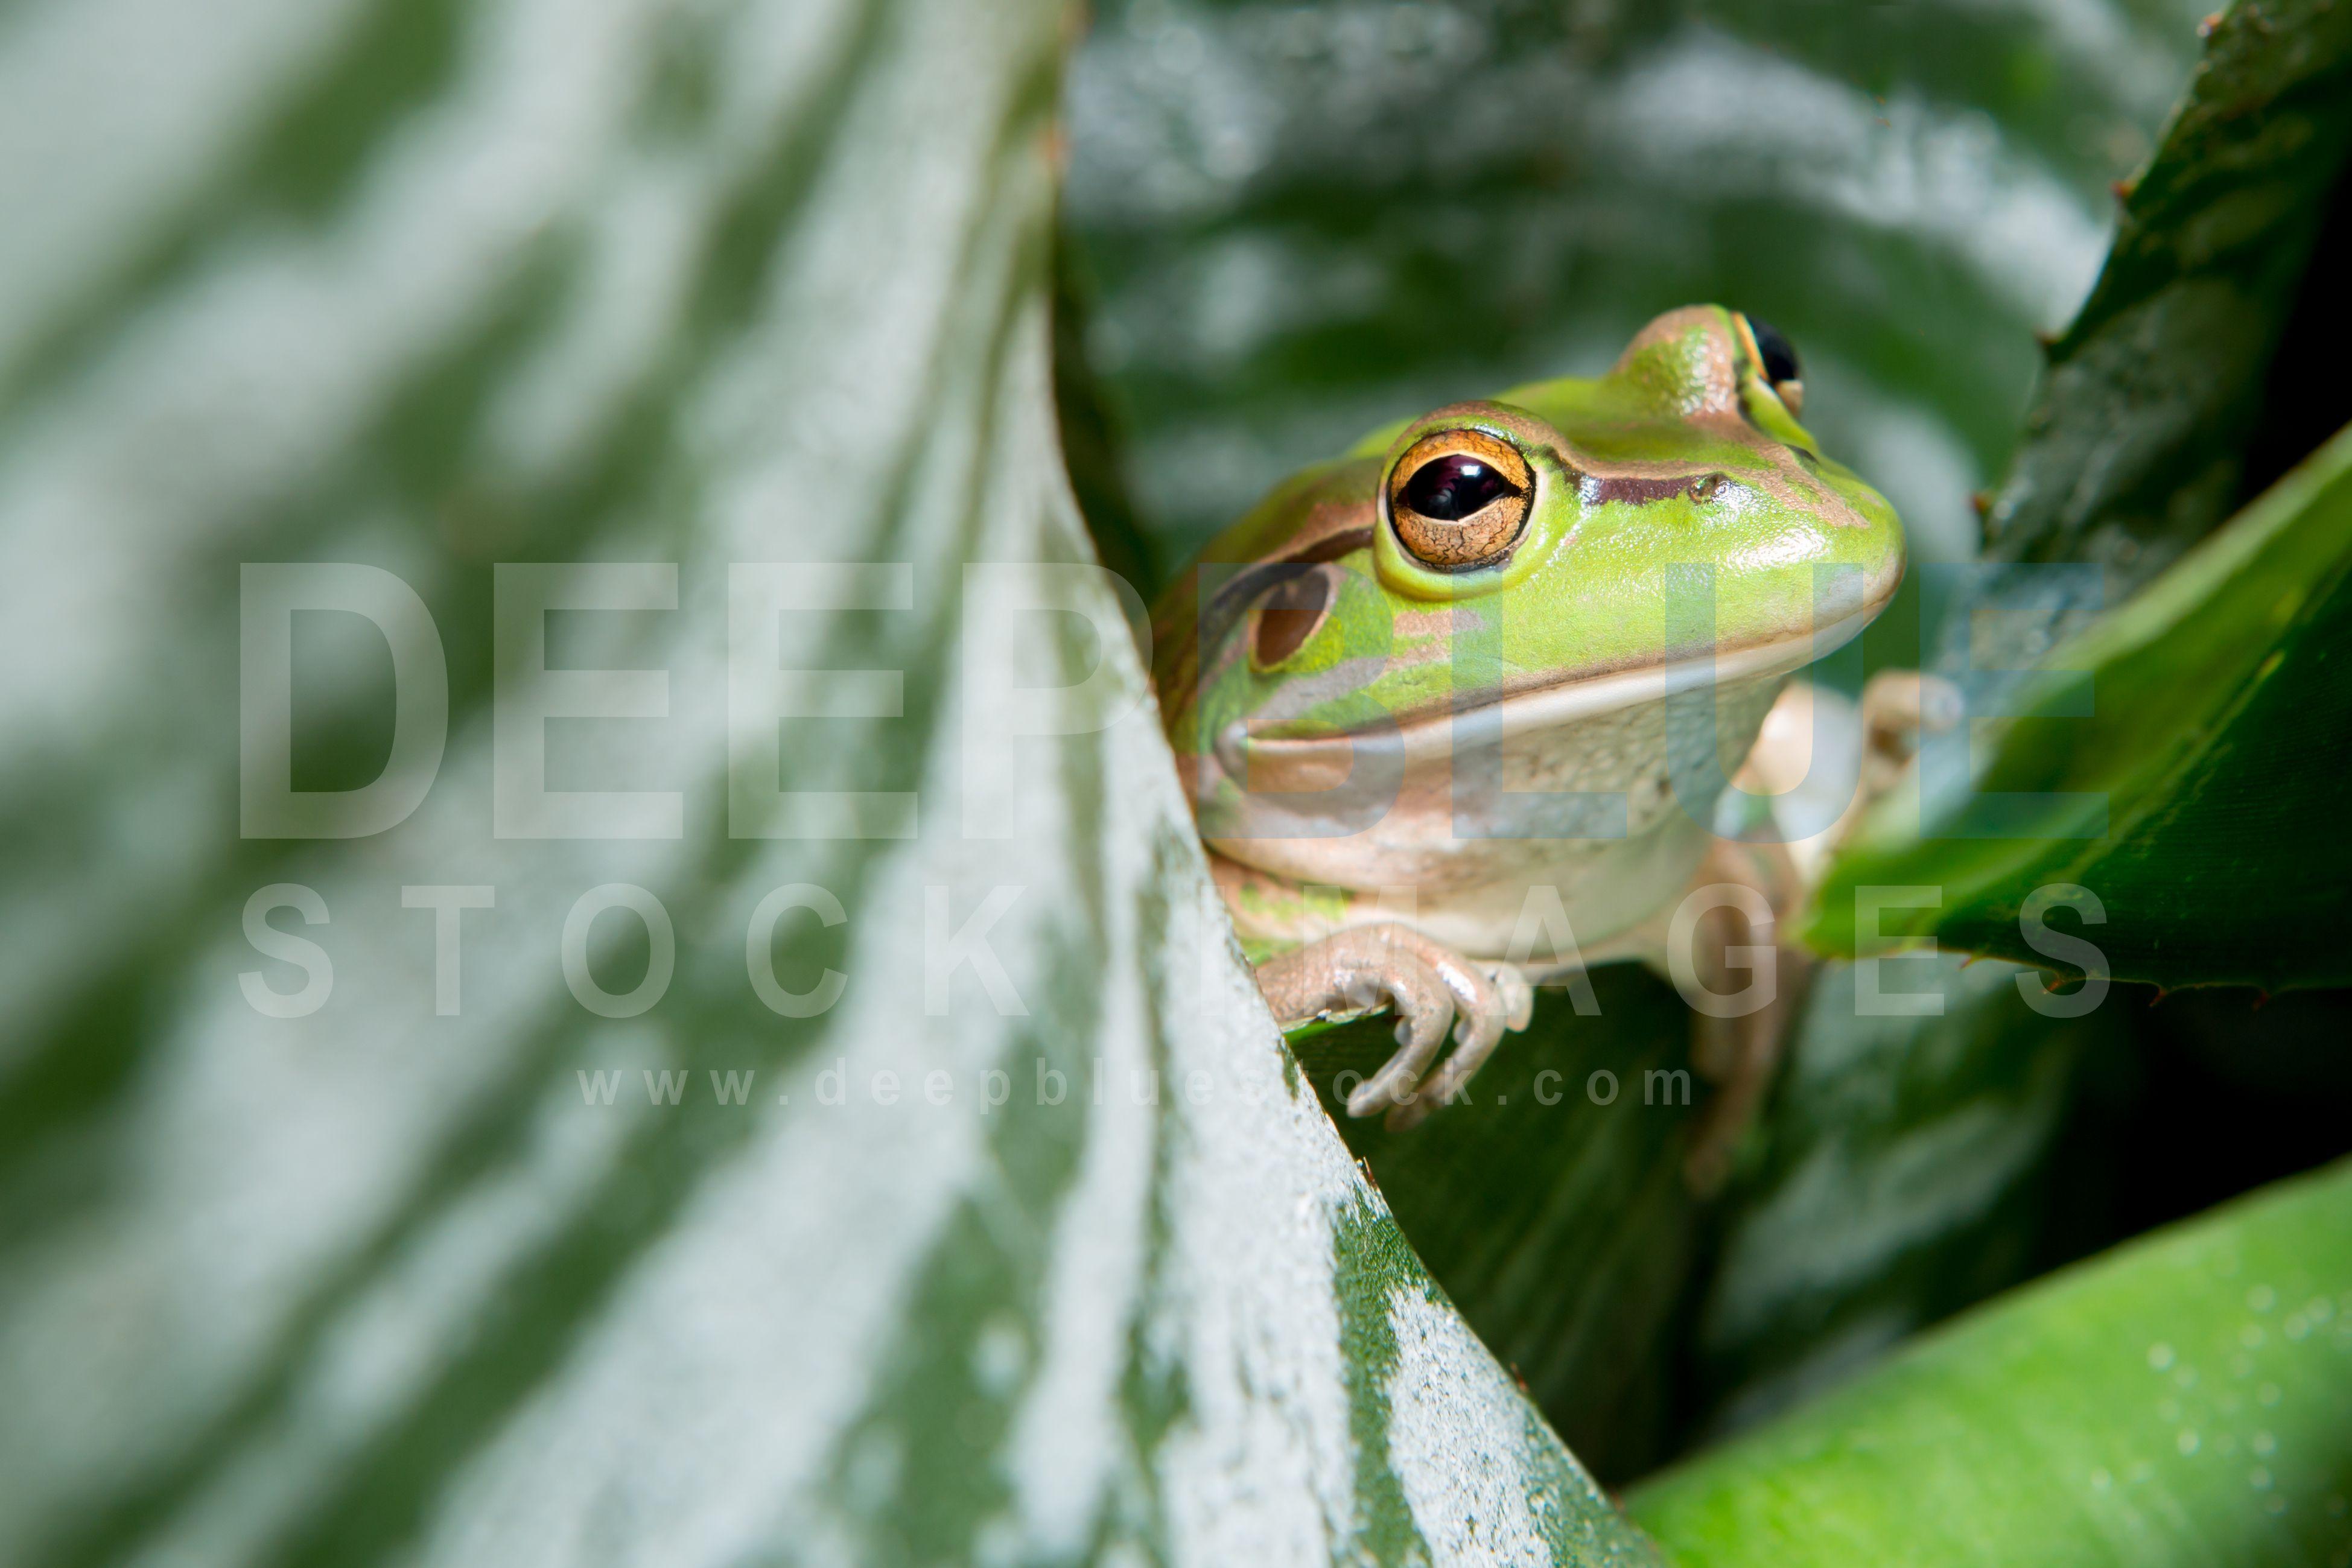 growling grass frog - Google Search | Australia animals ...